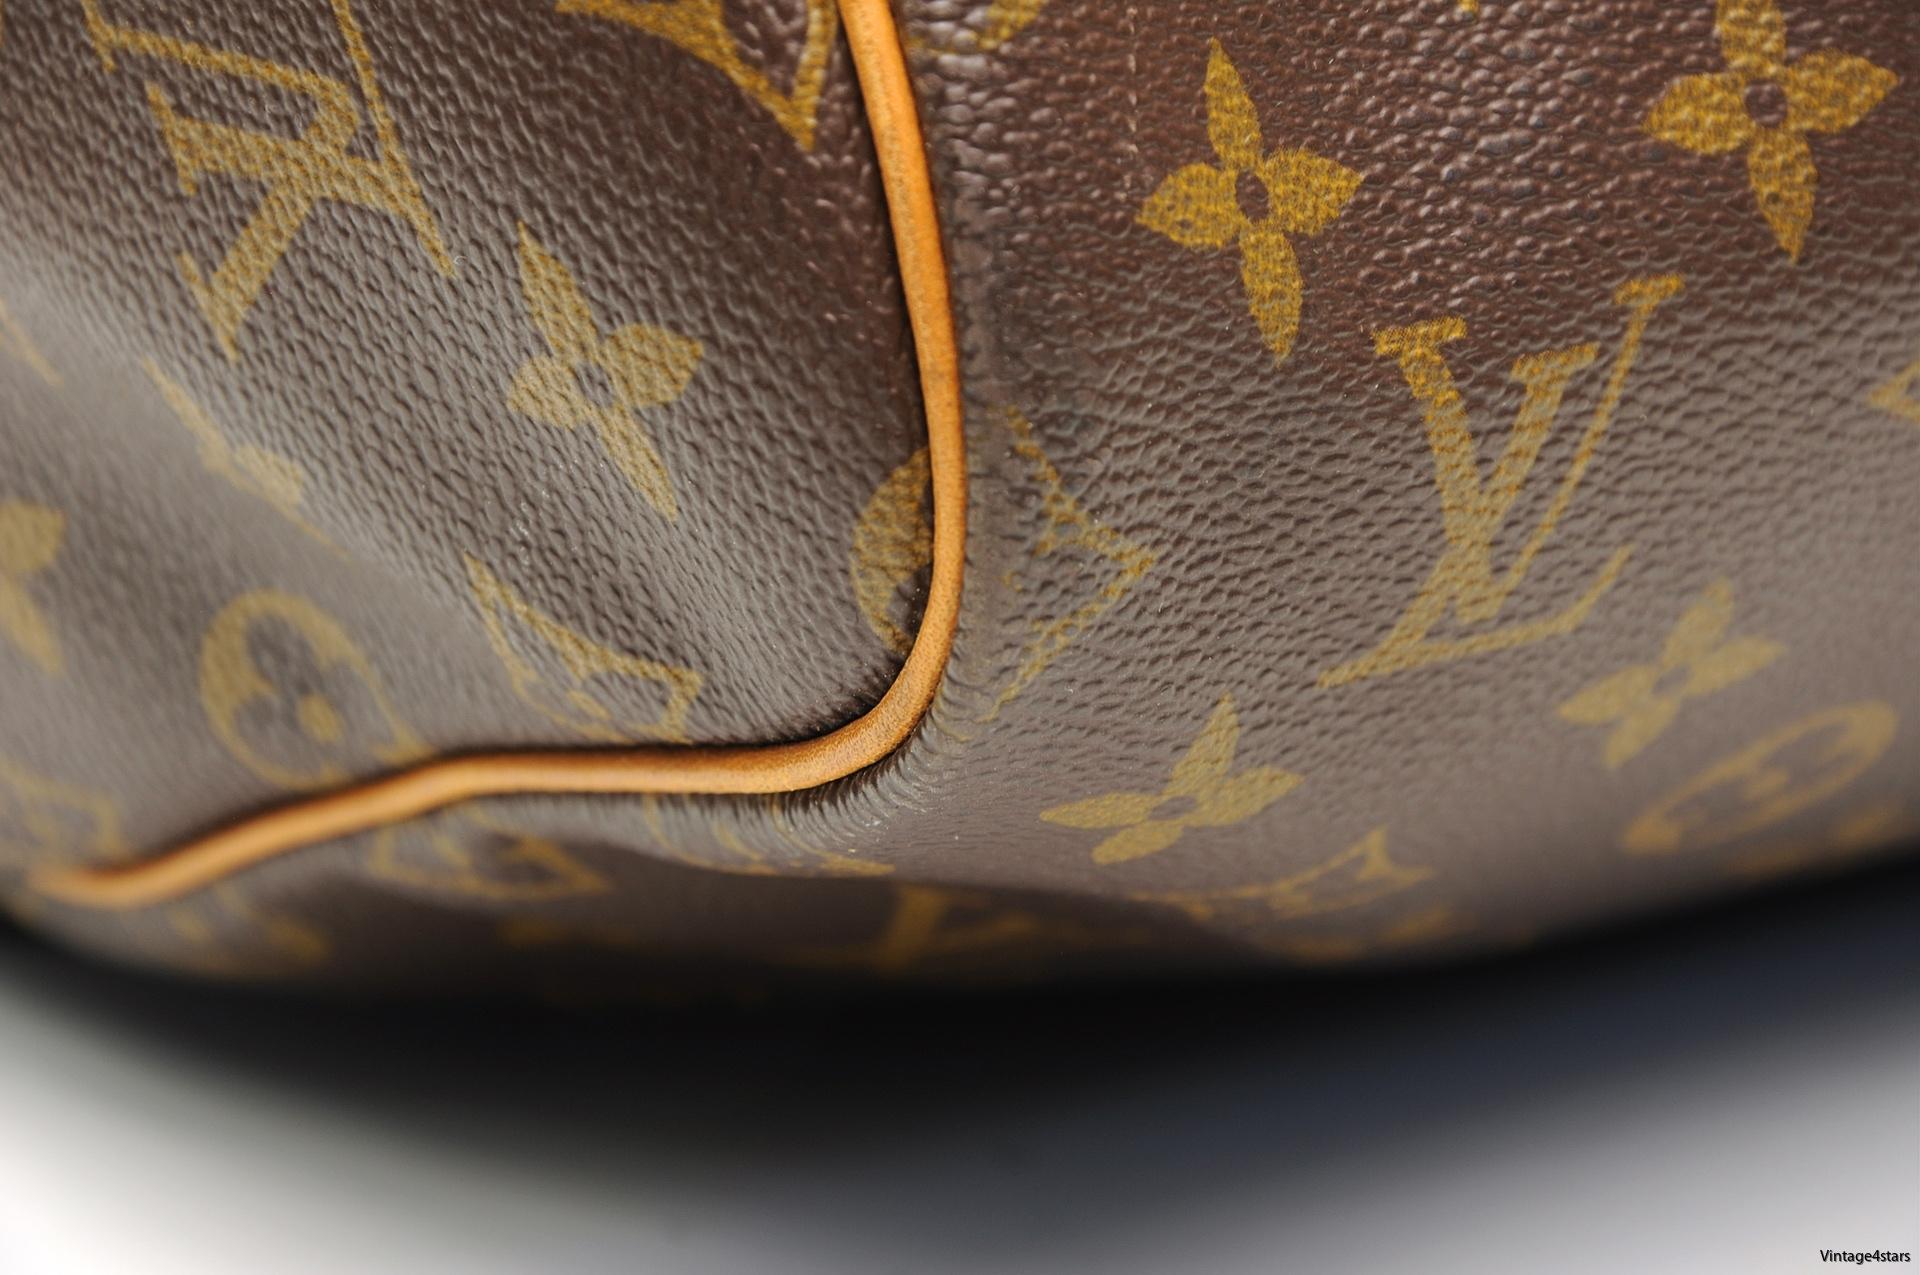 Louis Vuitton Keepall 55 Band 10a